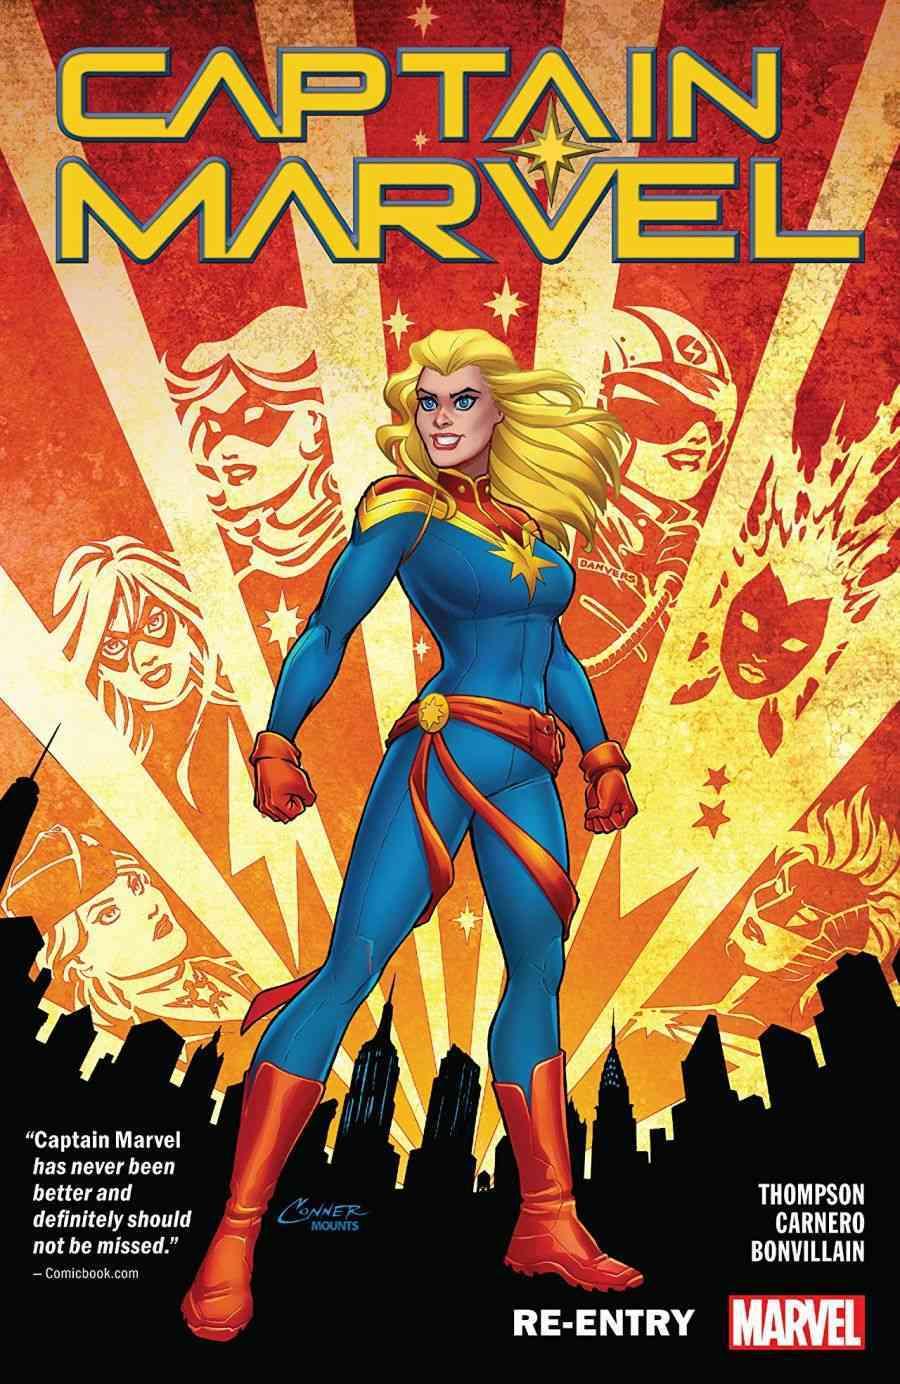 Captain Marvel Re-Entry